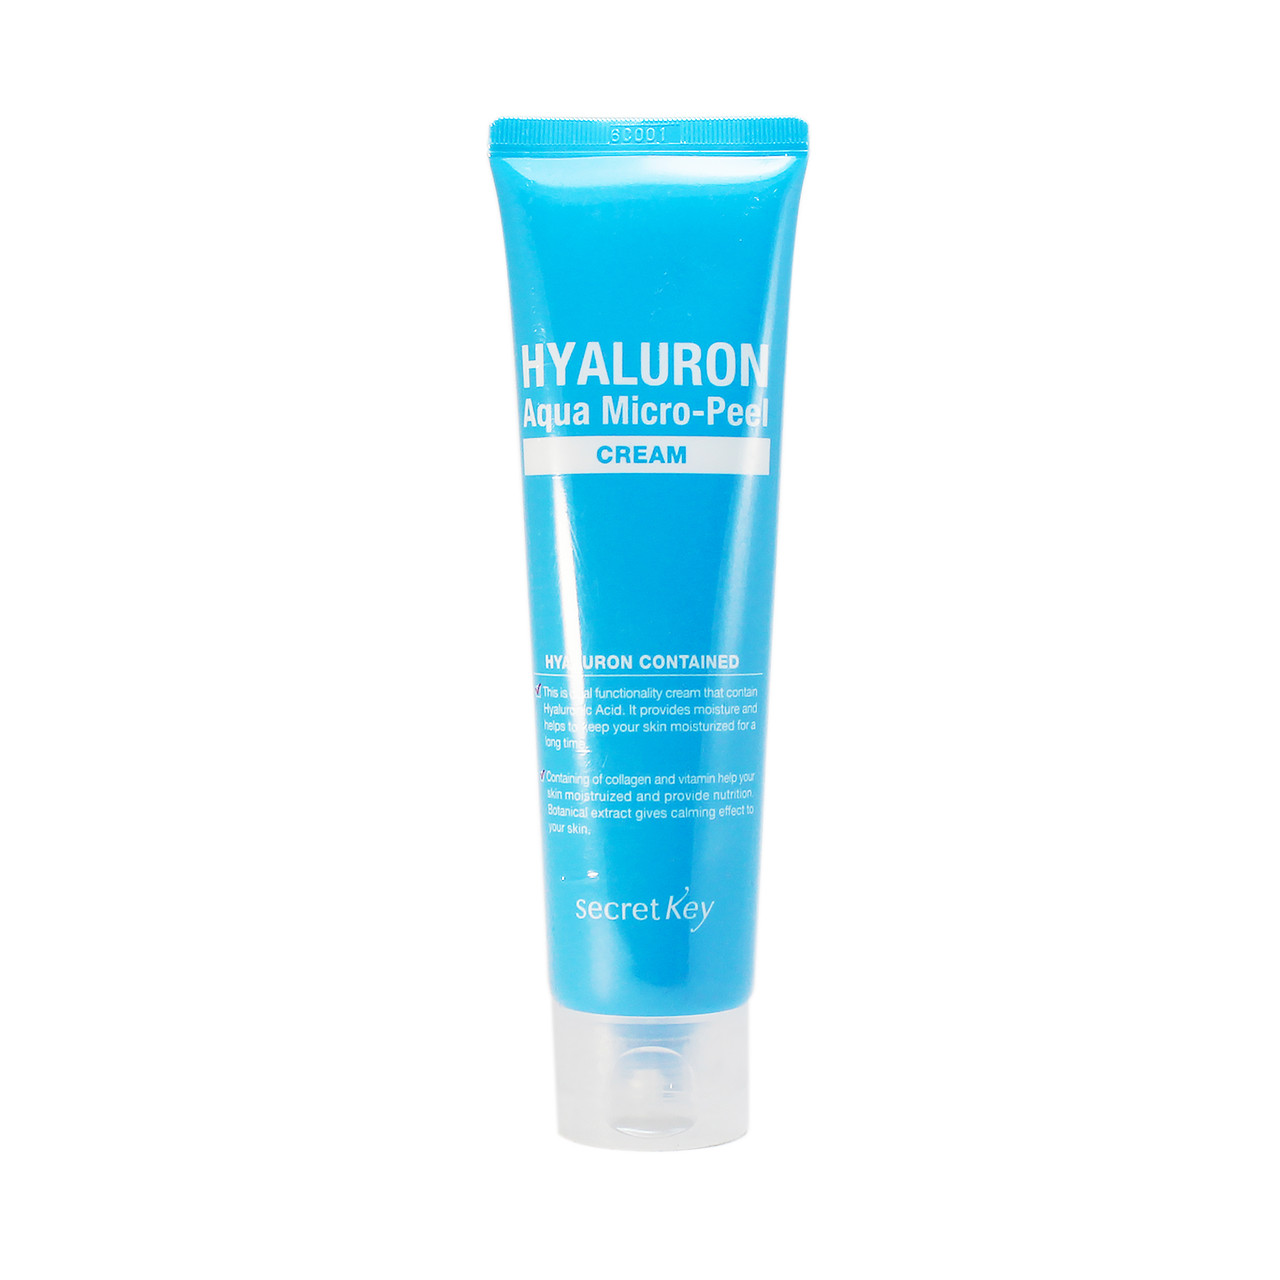 Secret Key Hyaluron Aqua Micro - Peel Cream - Гиалуроновый крем 70 гр.